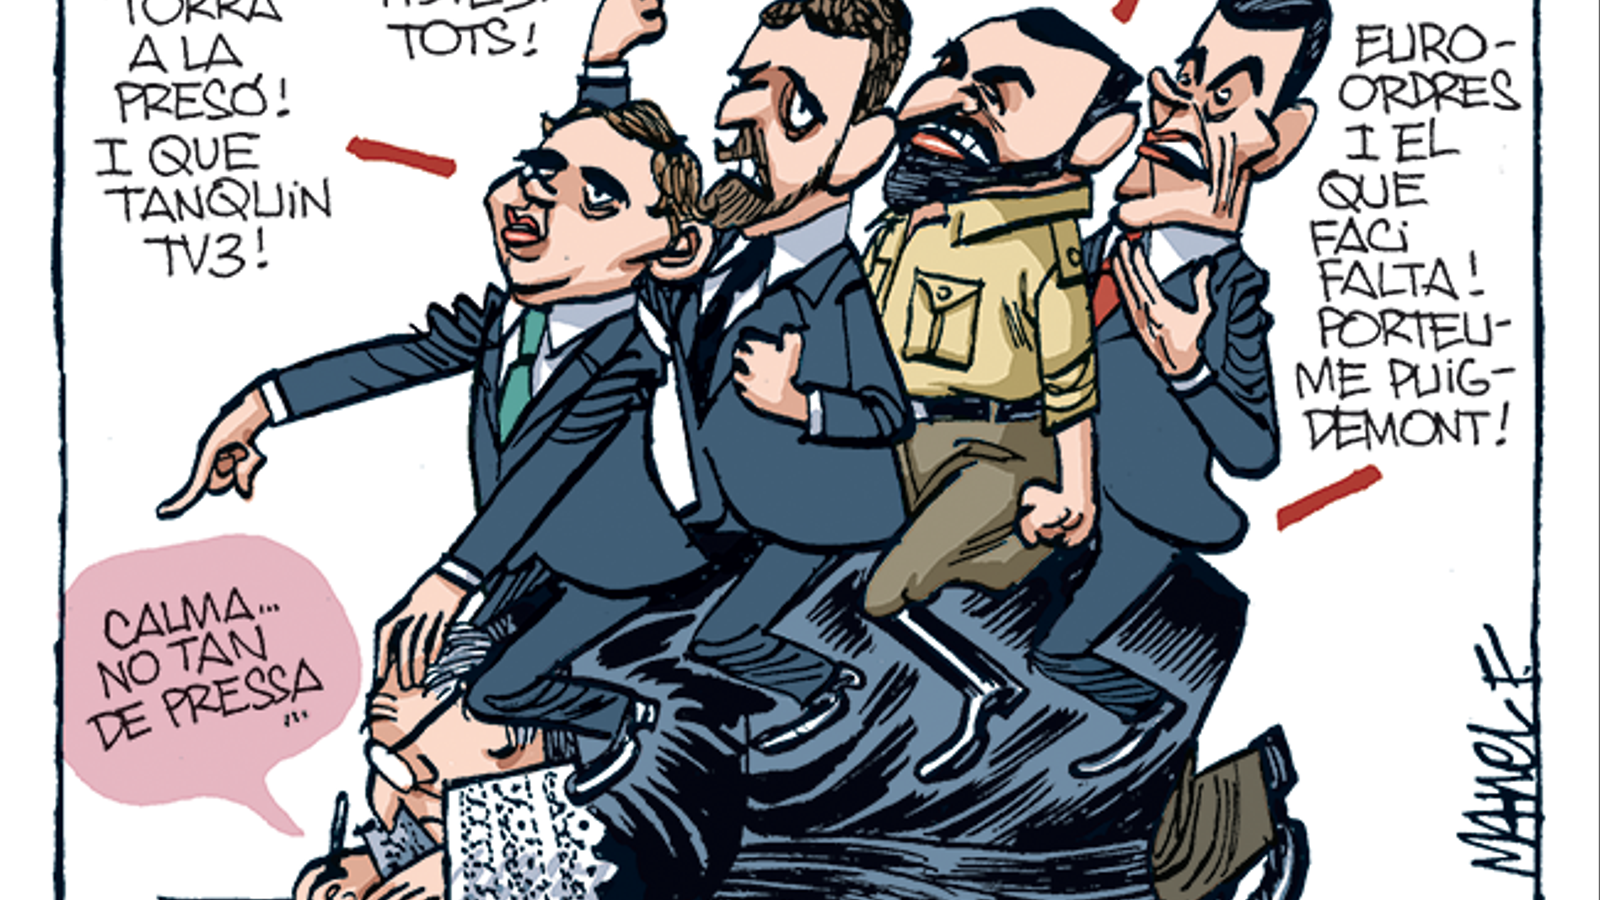 La vinyeta de Manel Fontdevila 08/11/19